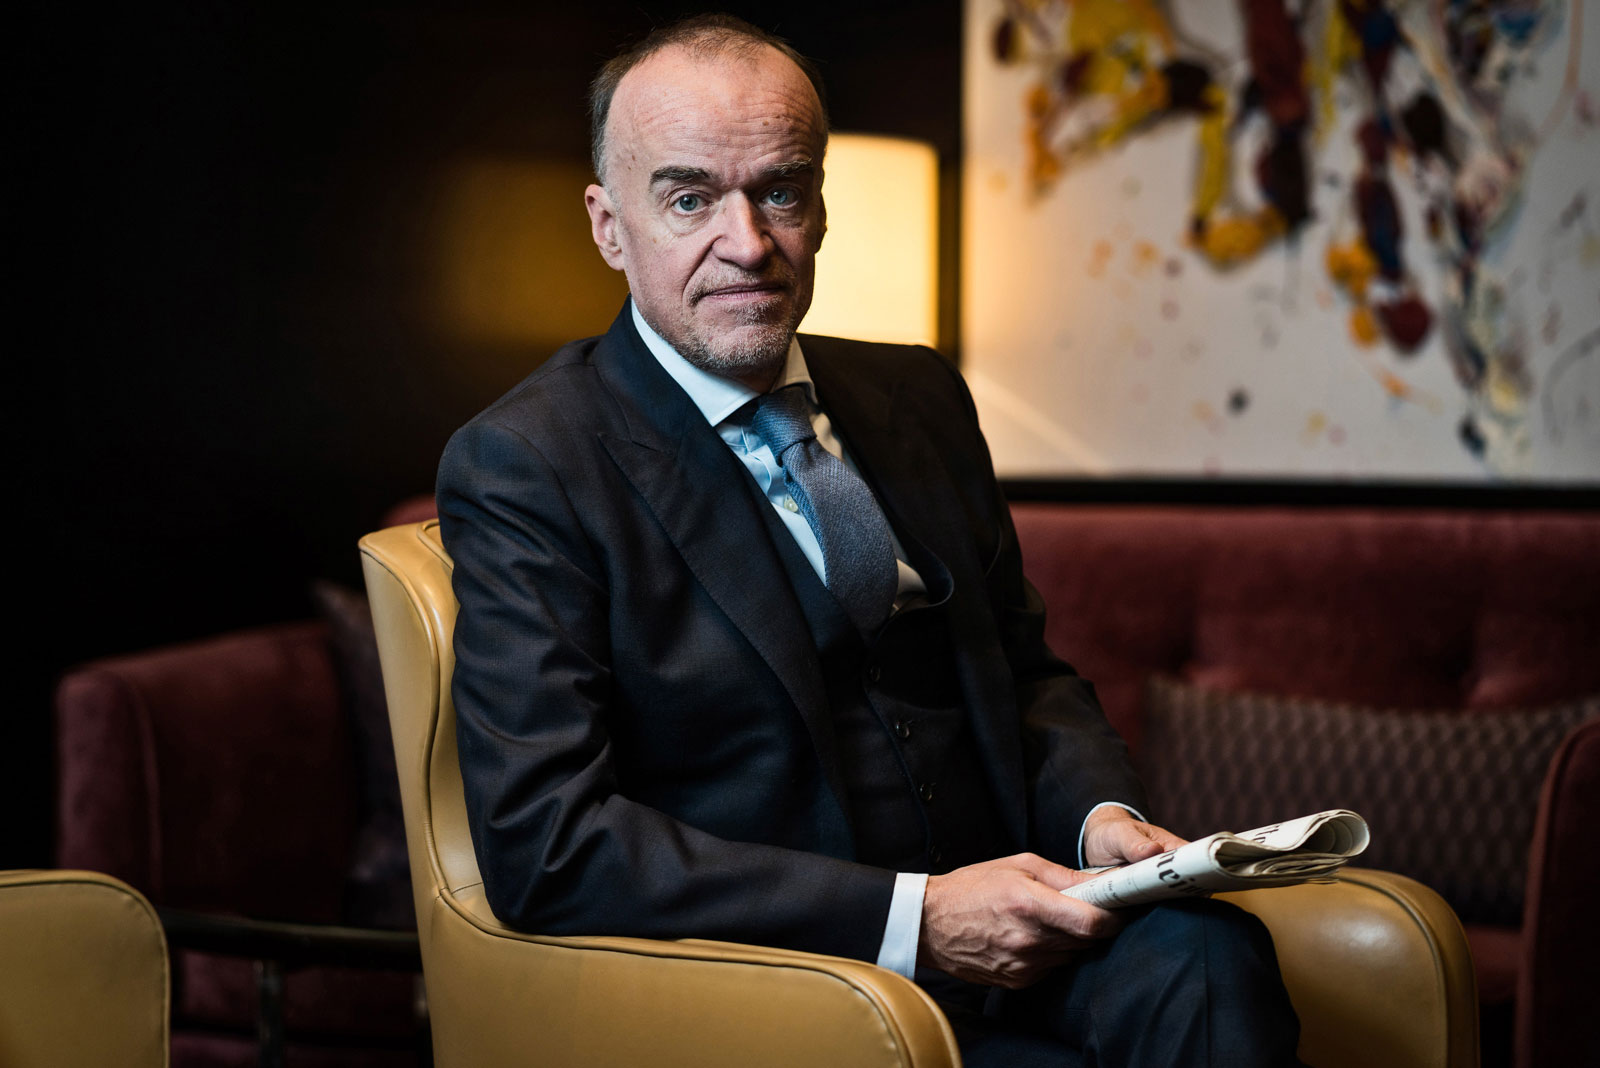 Lenny Fischer, Bankier